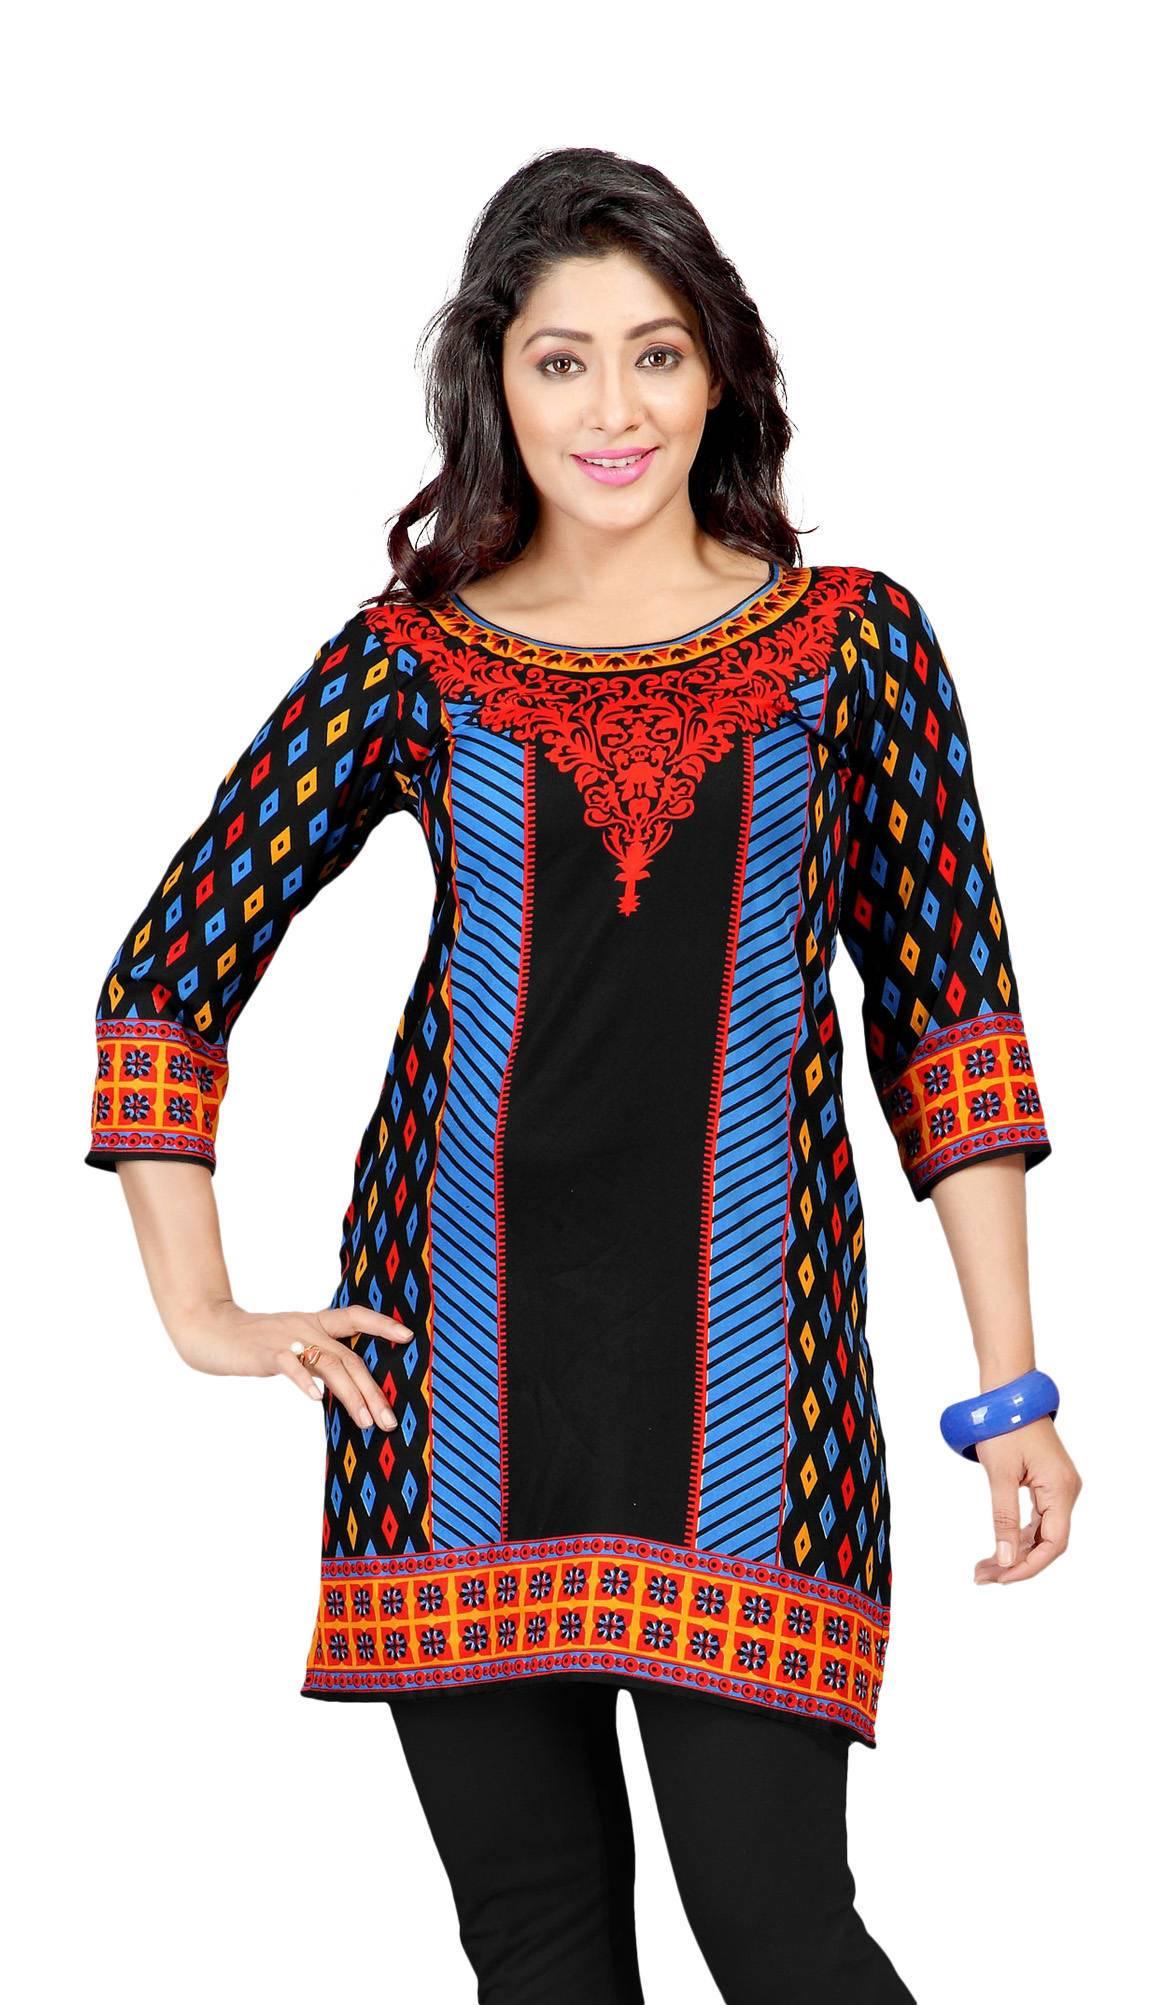 Black 34 Sleeve Indian Printed Kurti Tunic Women Kurta